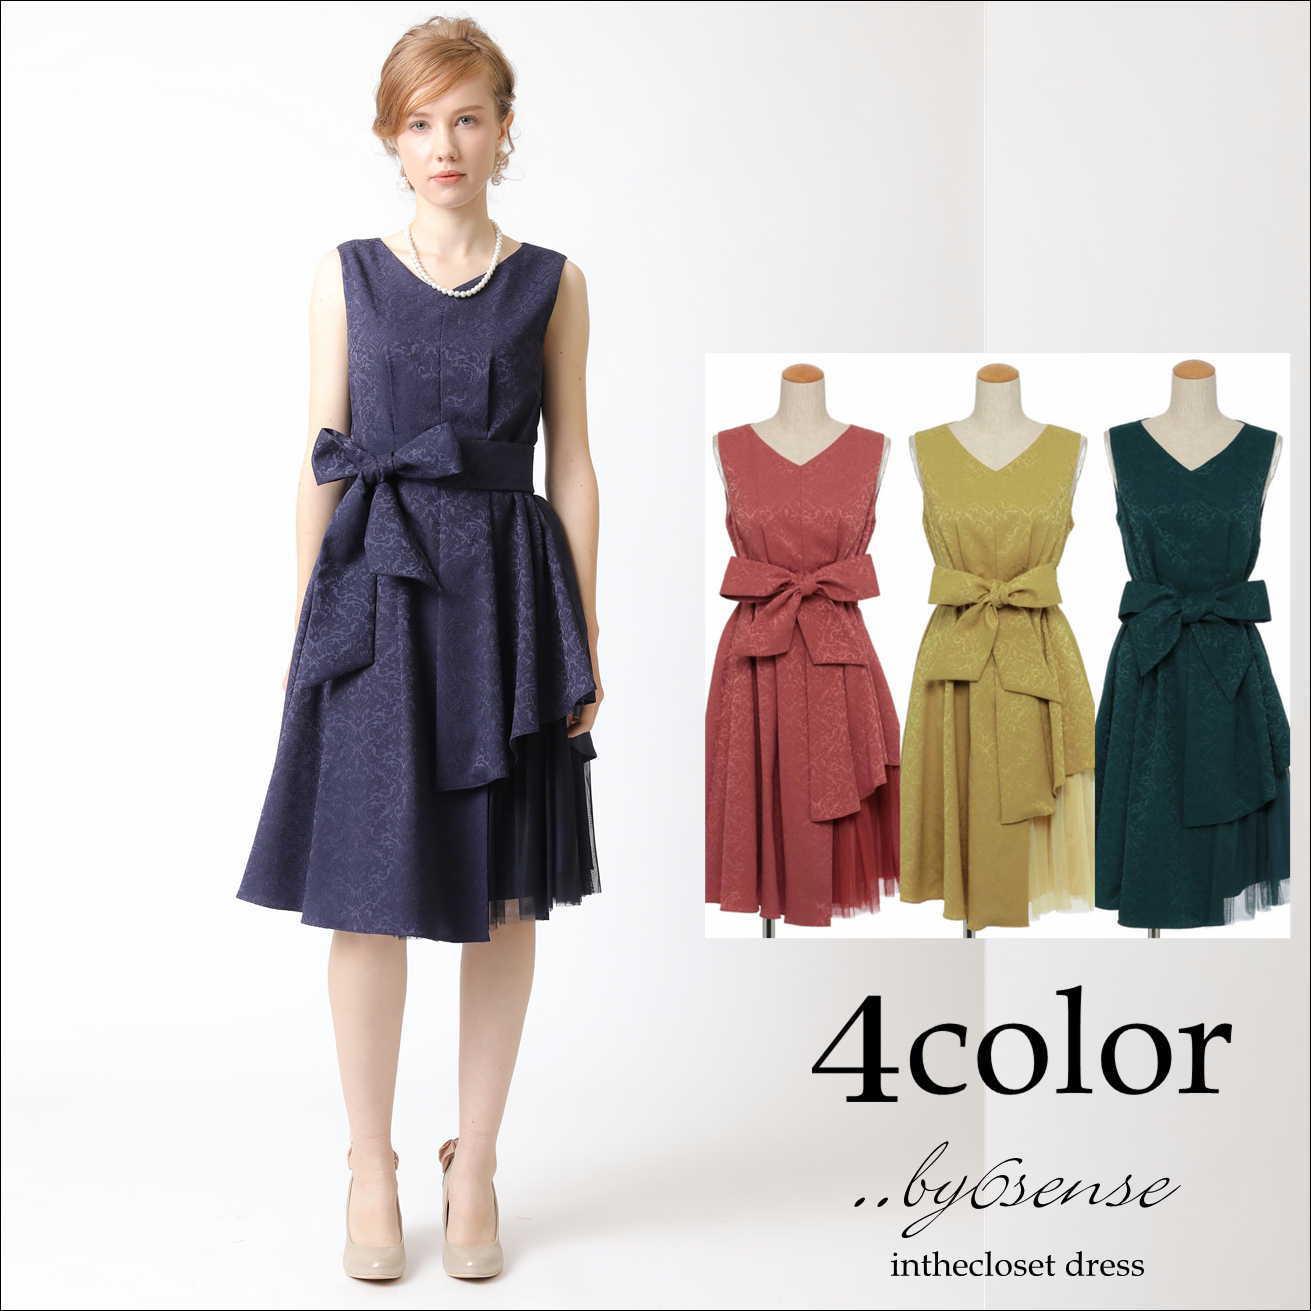 4color(ネイビー) サッシュベルト付き裾アシメレースミドル丈ジャガードワンピース Dorry Doll(ドリードールドレス)